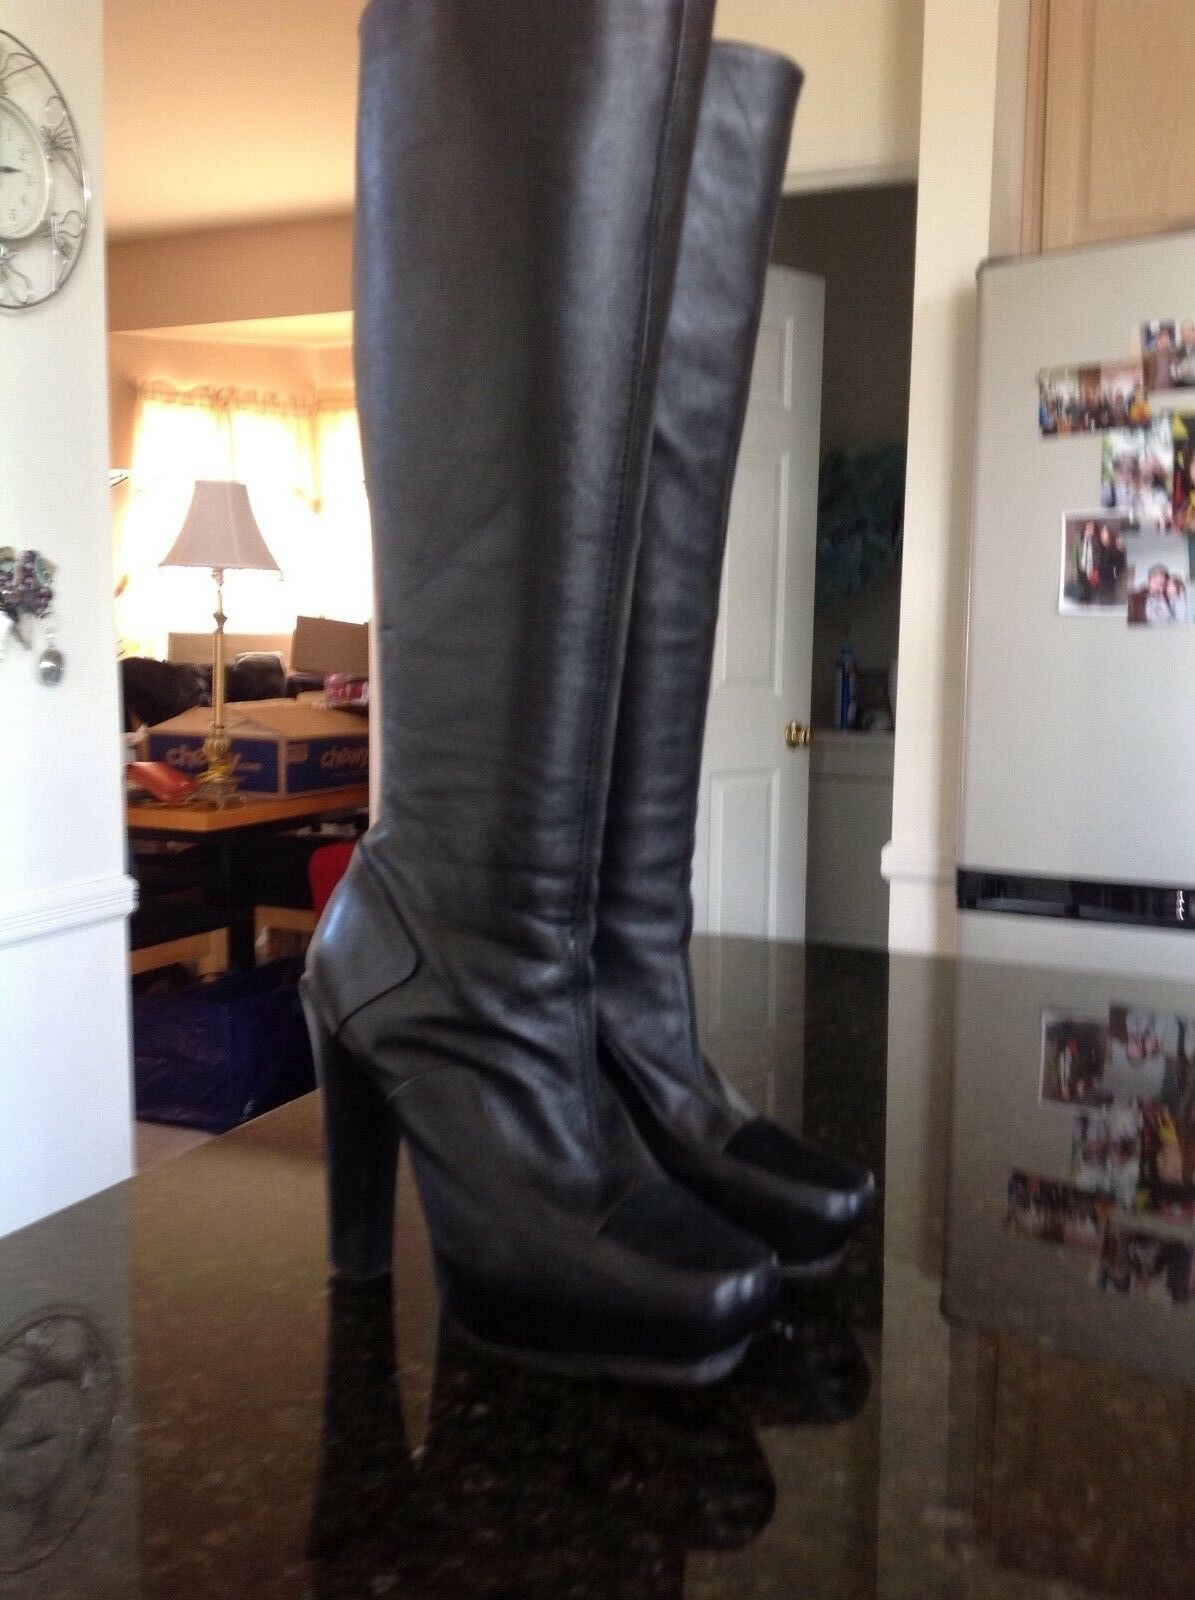 L.A.M.B. Gwen Stefani Navigator de la rodilla botas altas de cuero negro-mujer 'S Talla 6M